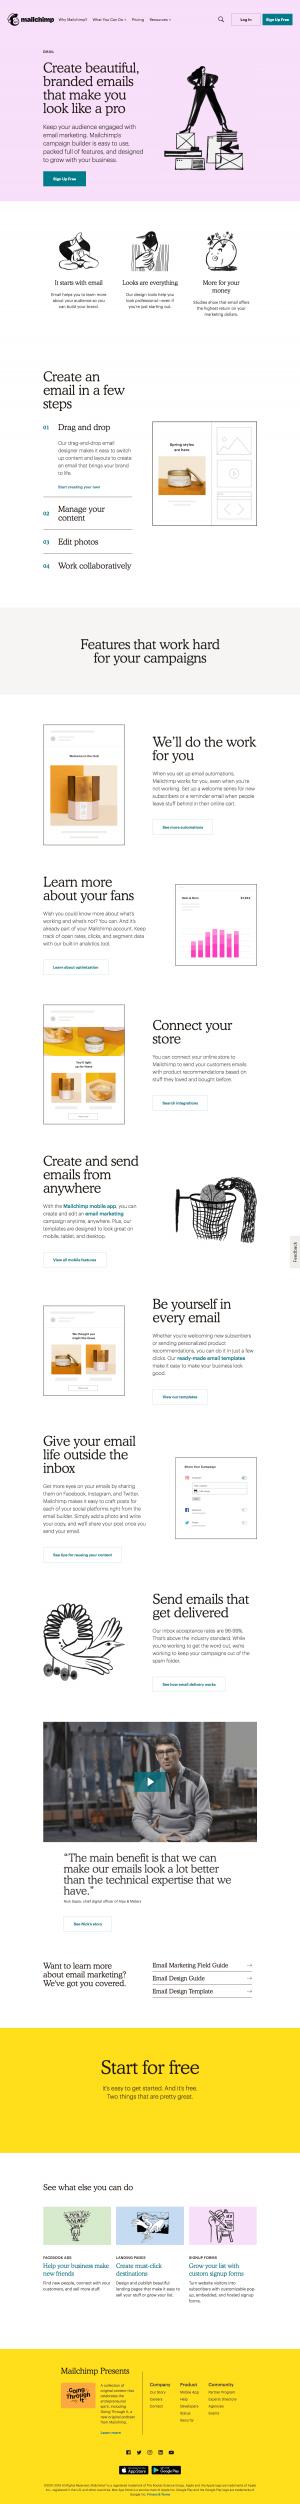 Mailchimp - Features page 3